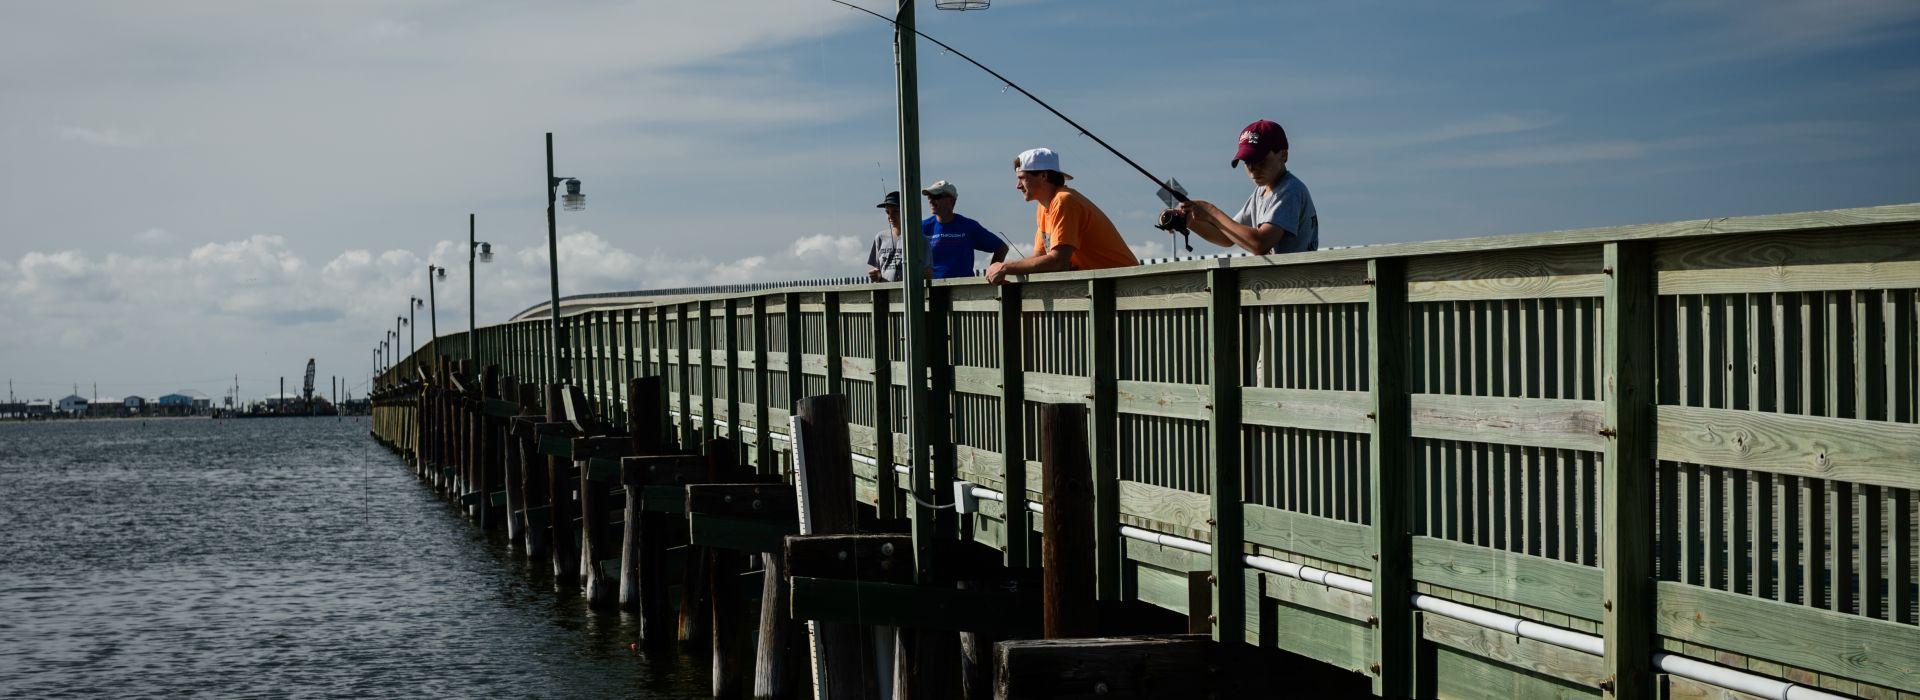 Fishing Pier, Grand Isle